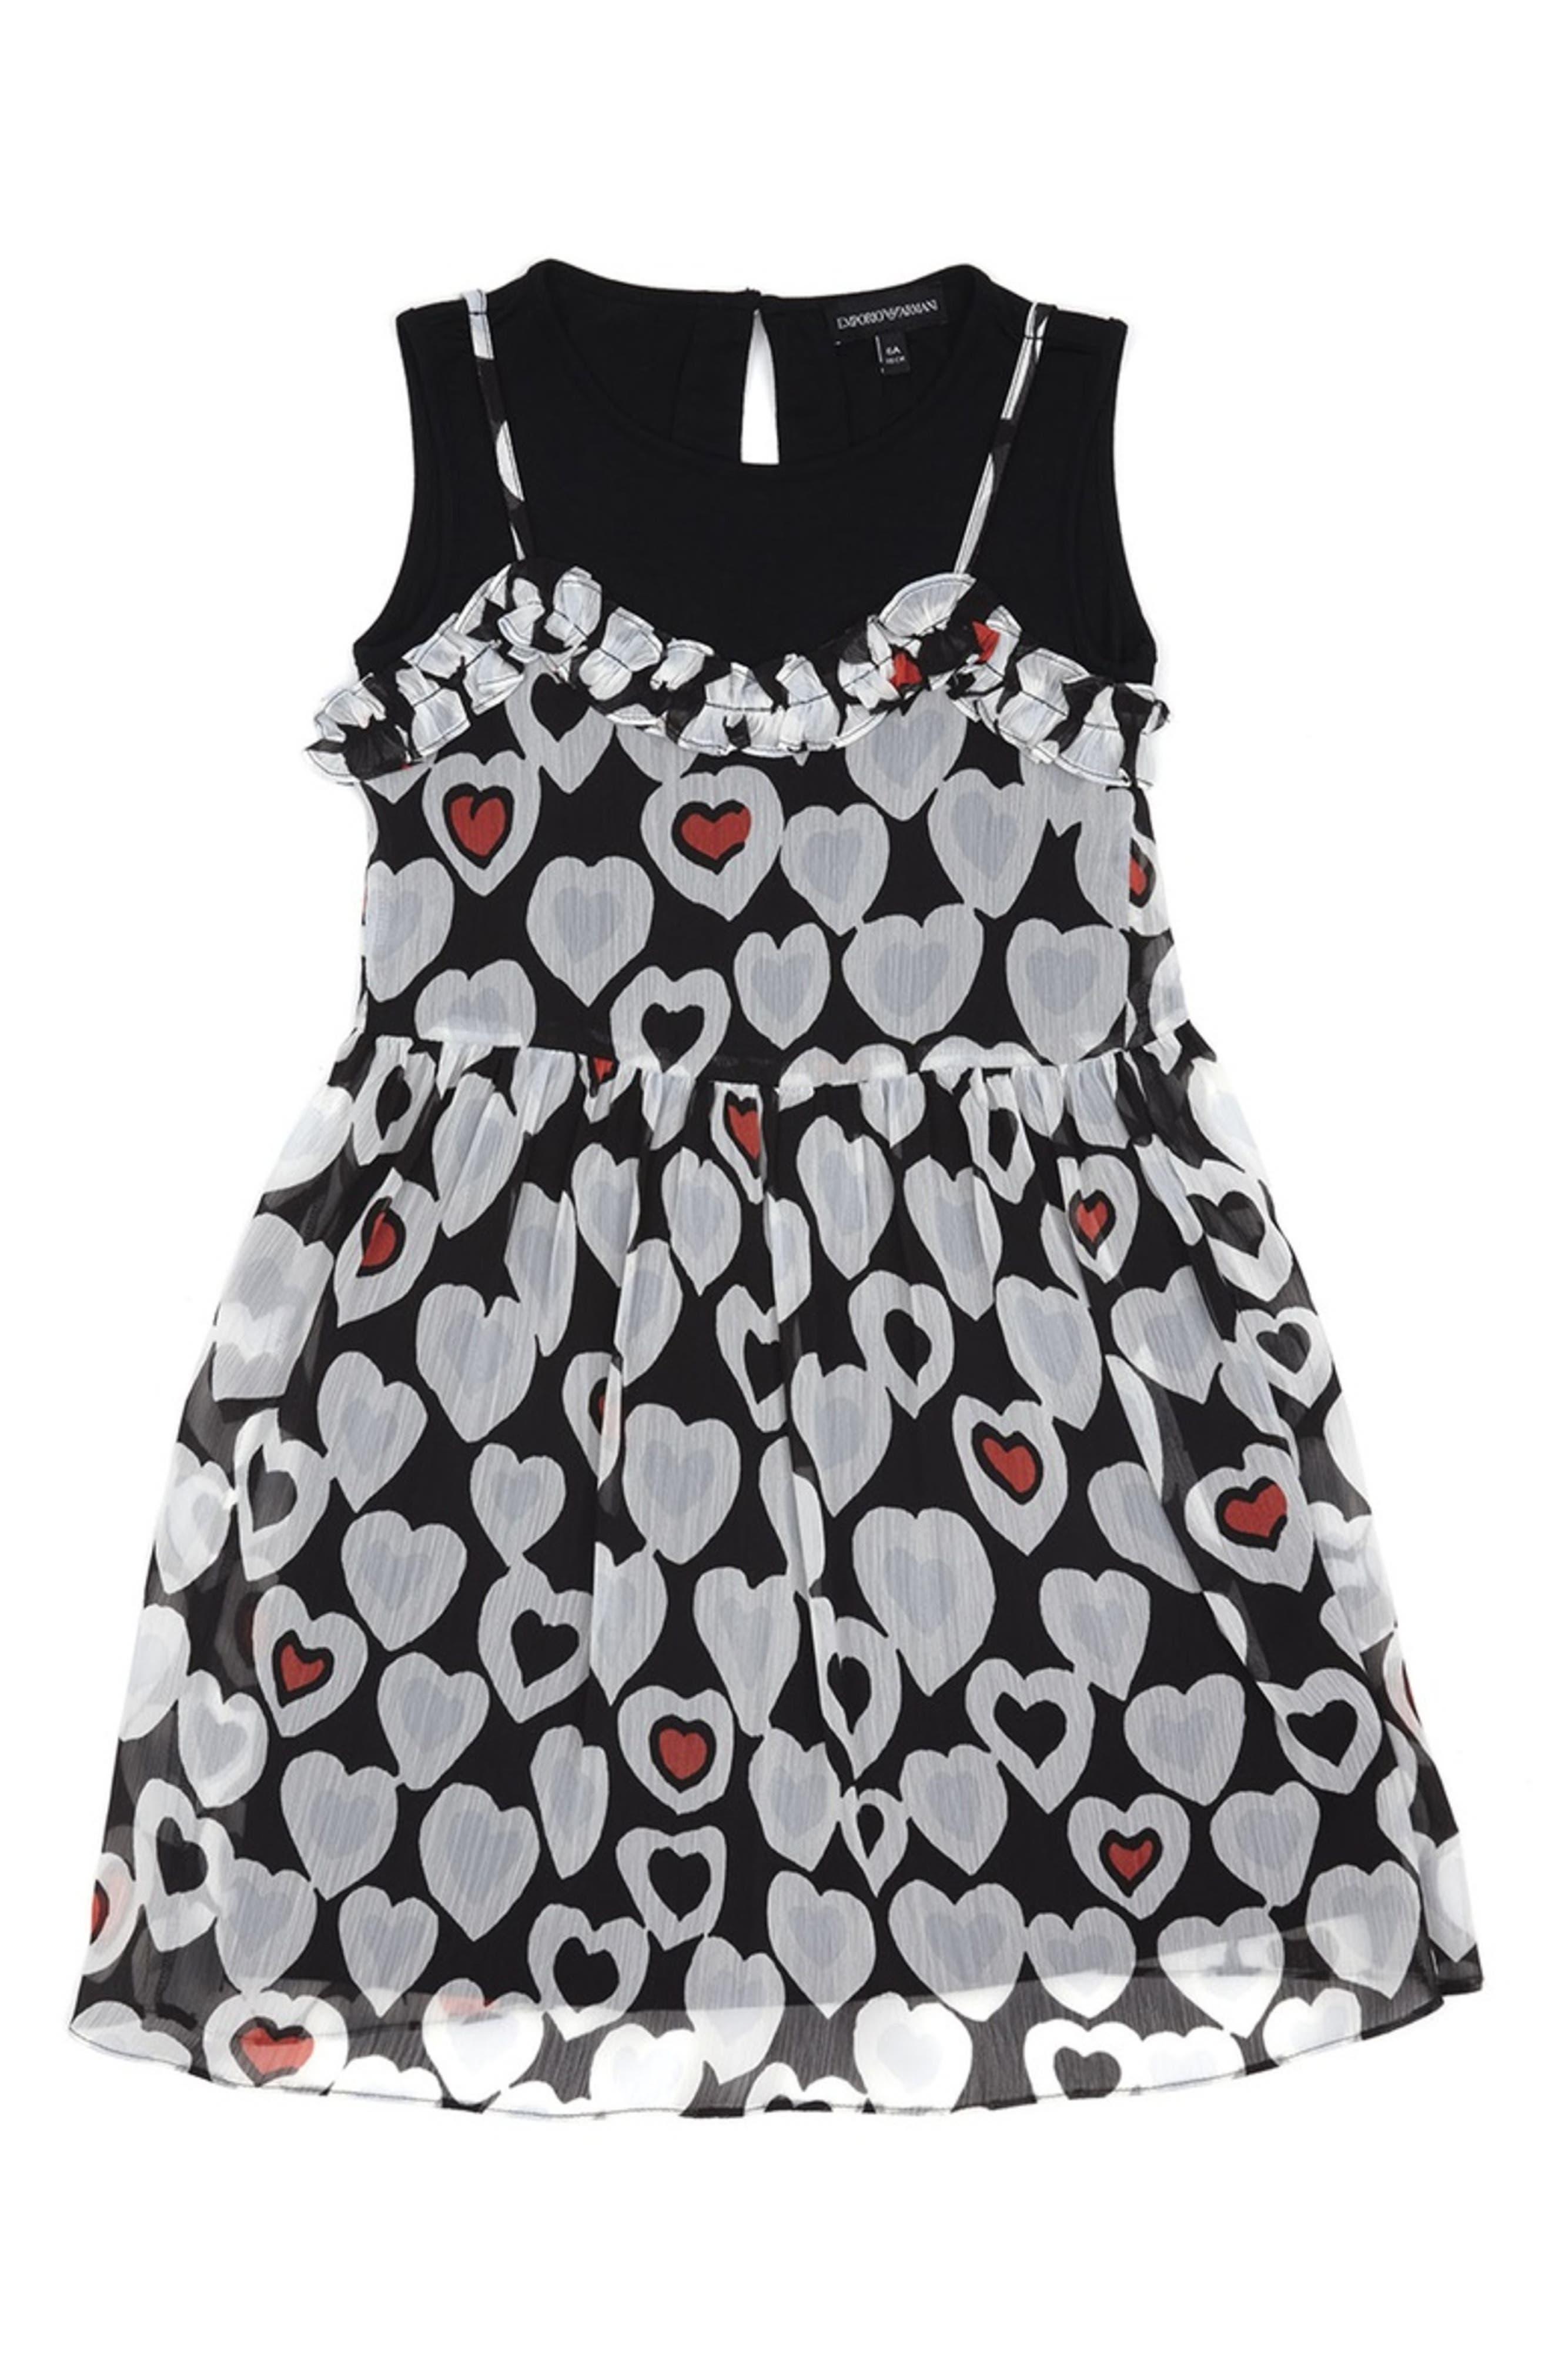 ARMANI JUNIOR, Heart Print Sleeveless Dress, Main thumbnail 1, color, 001